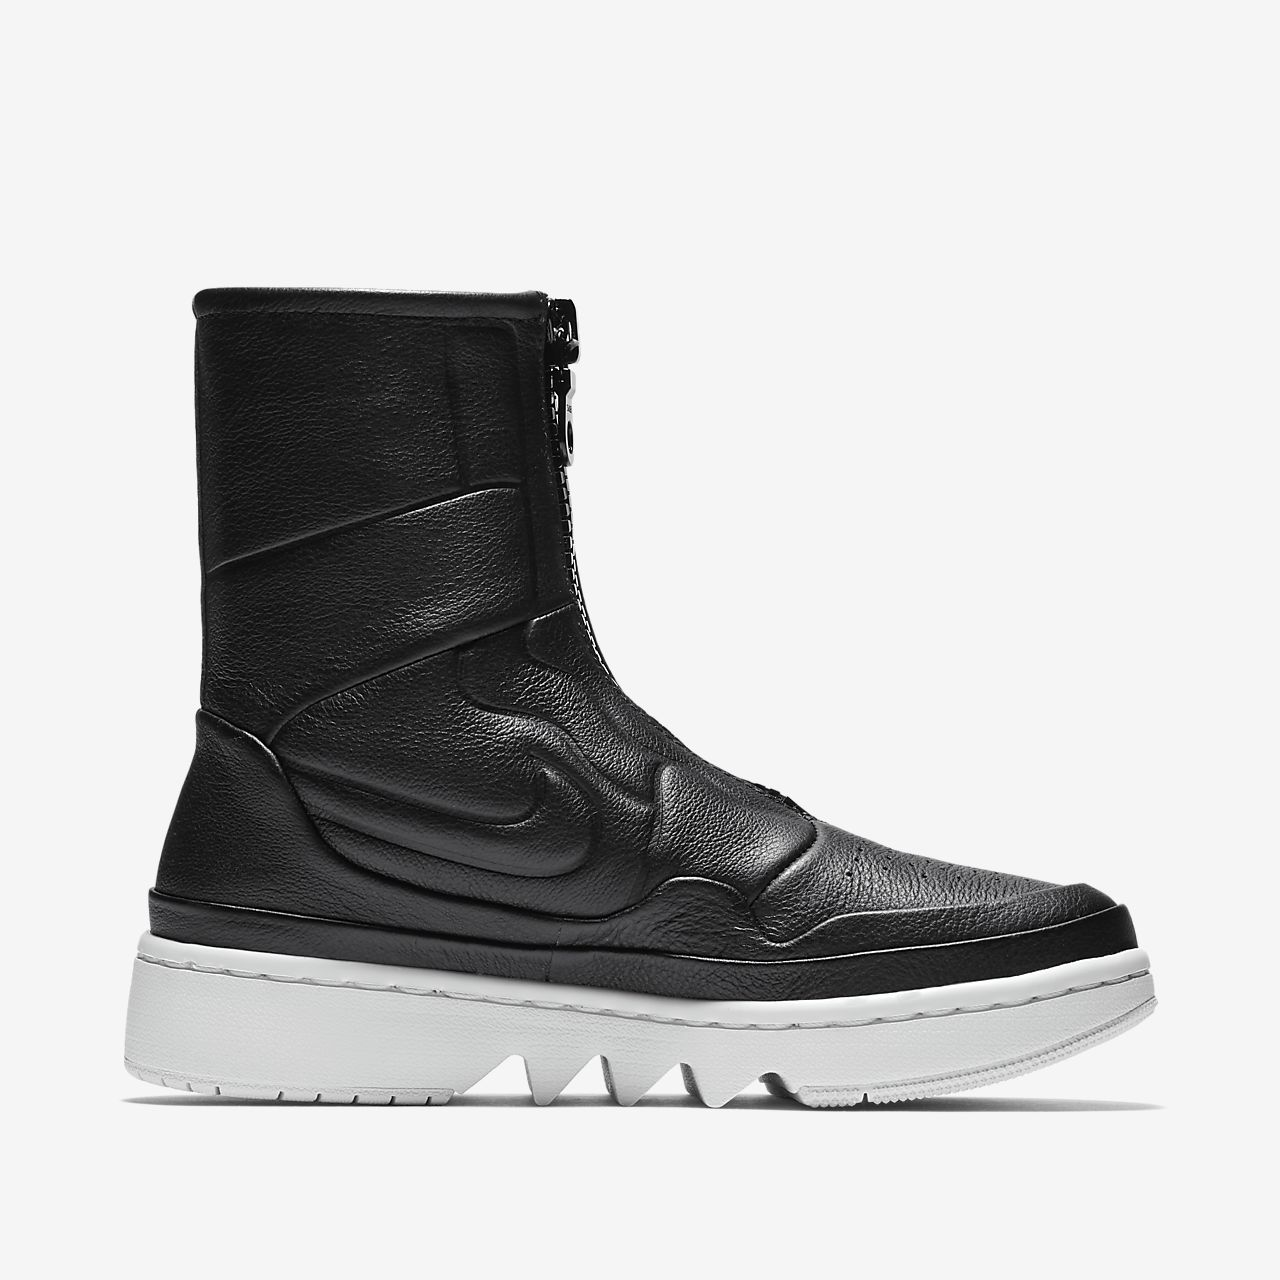 innovative design e3083 df71d Buty damskie Air Jordan 1 Jester XX. Nike.com PL